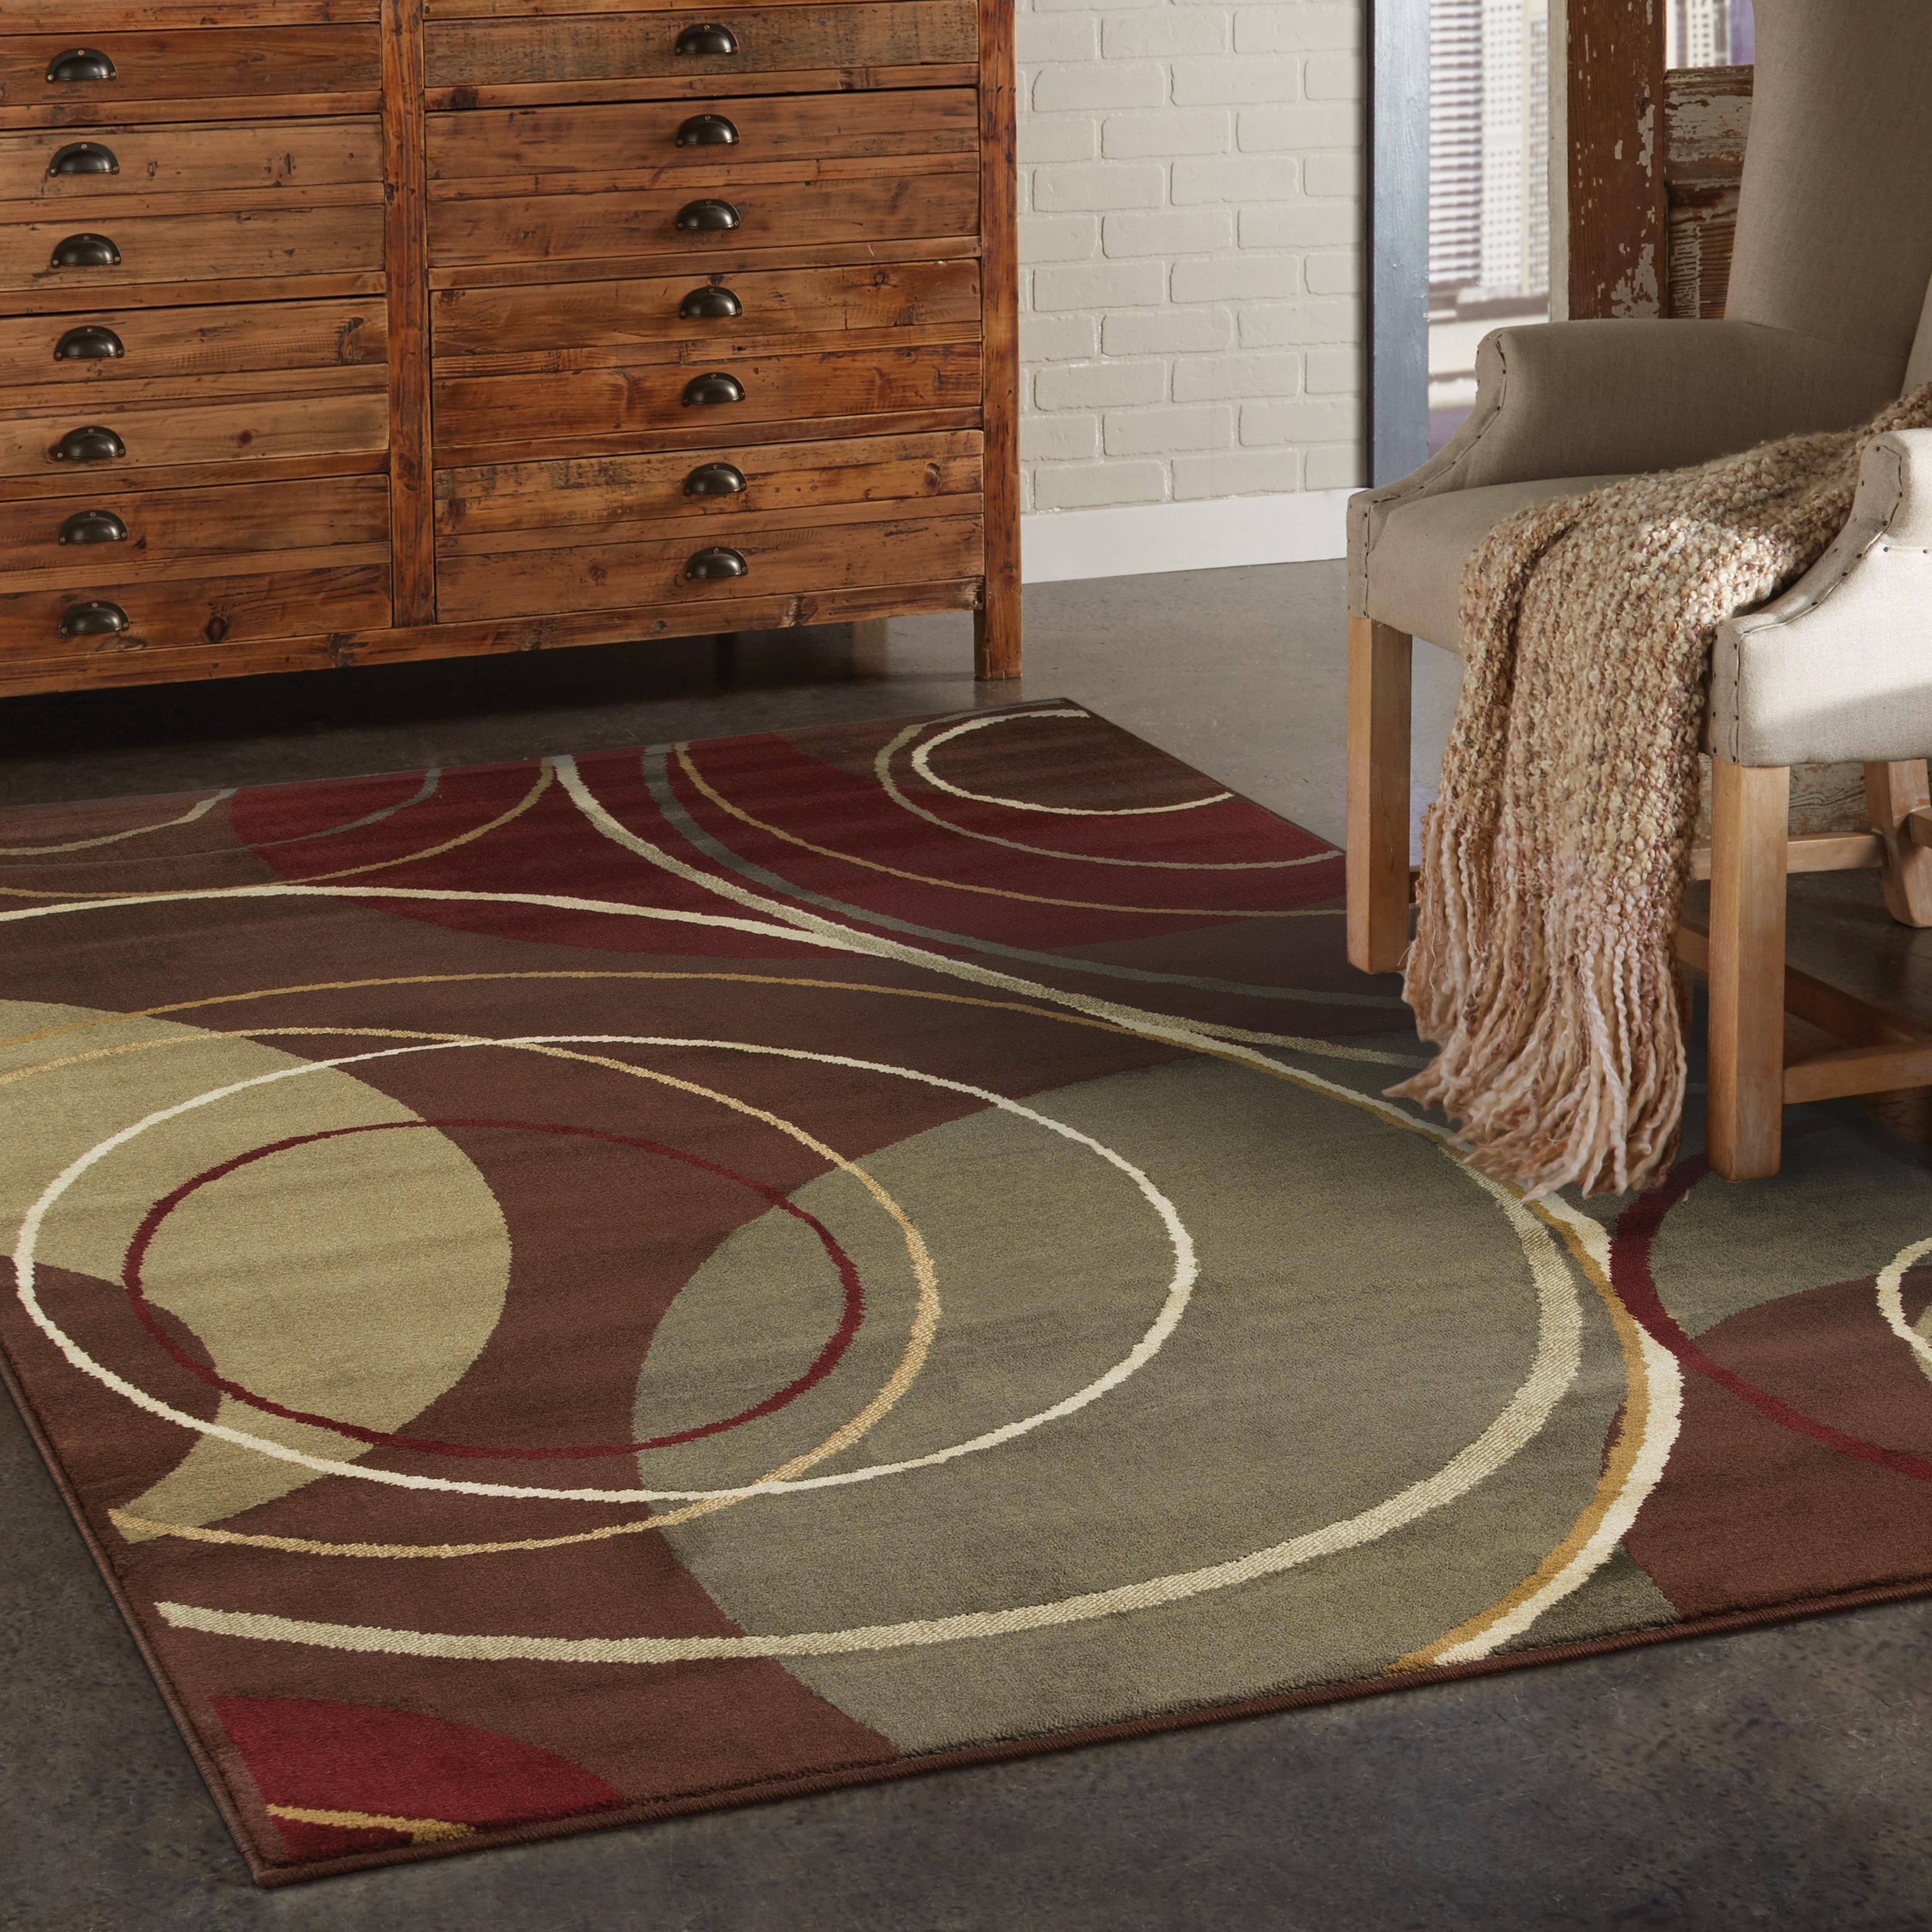 Enchanting Circles Brown/ Red Area Rug (8'2 x 10') - 8'2 x 10'